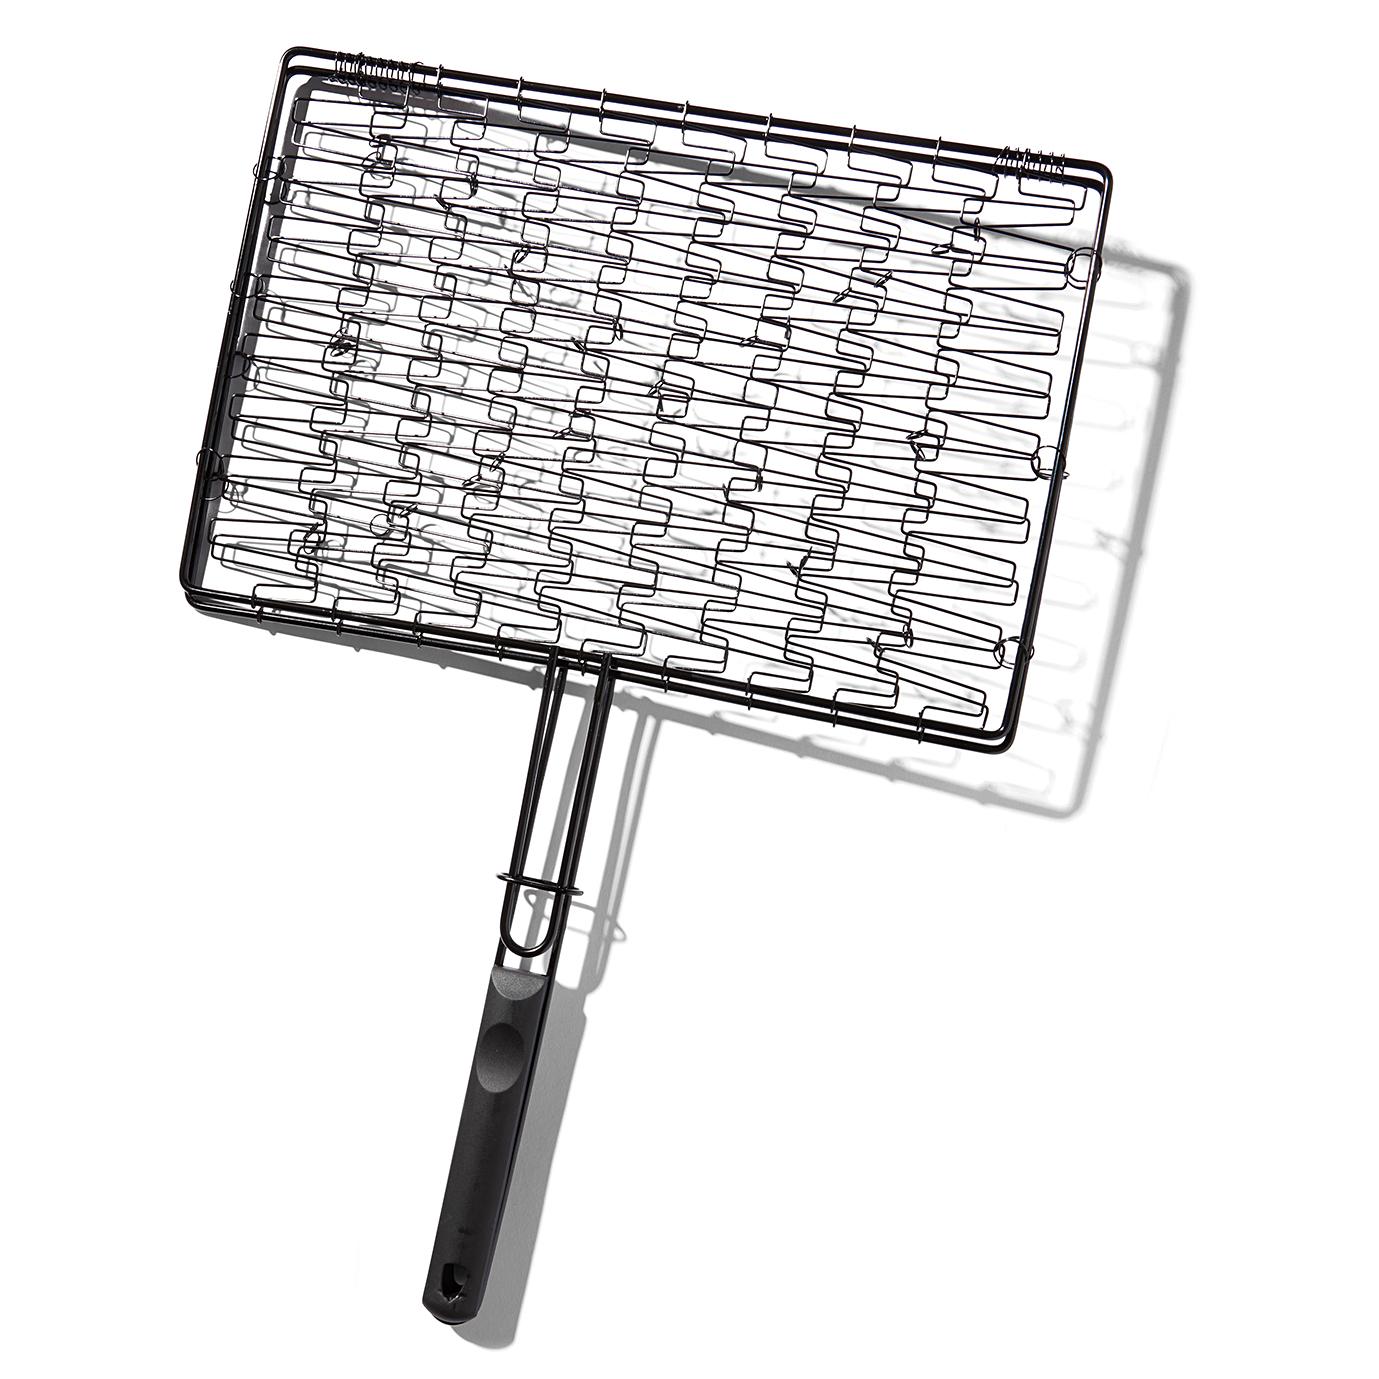 Mr. BBQ Deluxe Non-Stick Flexible/Expandable Grilling Basket